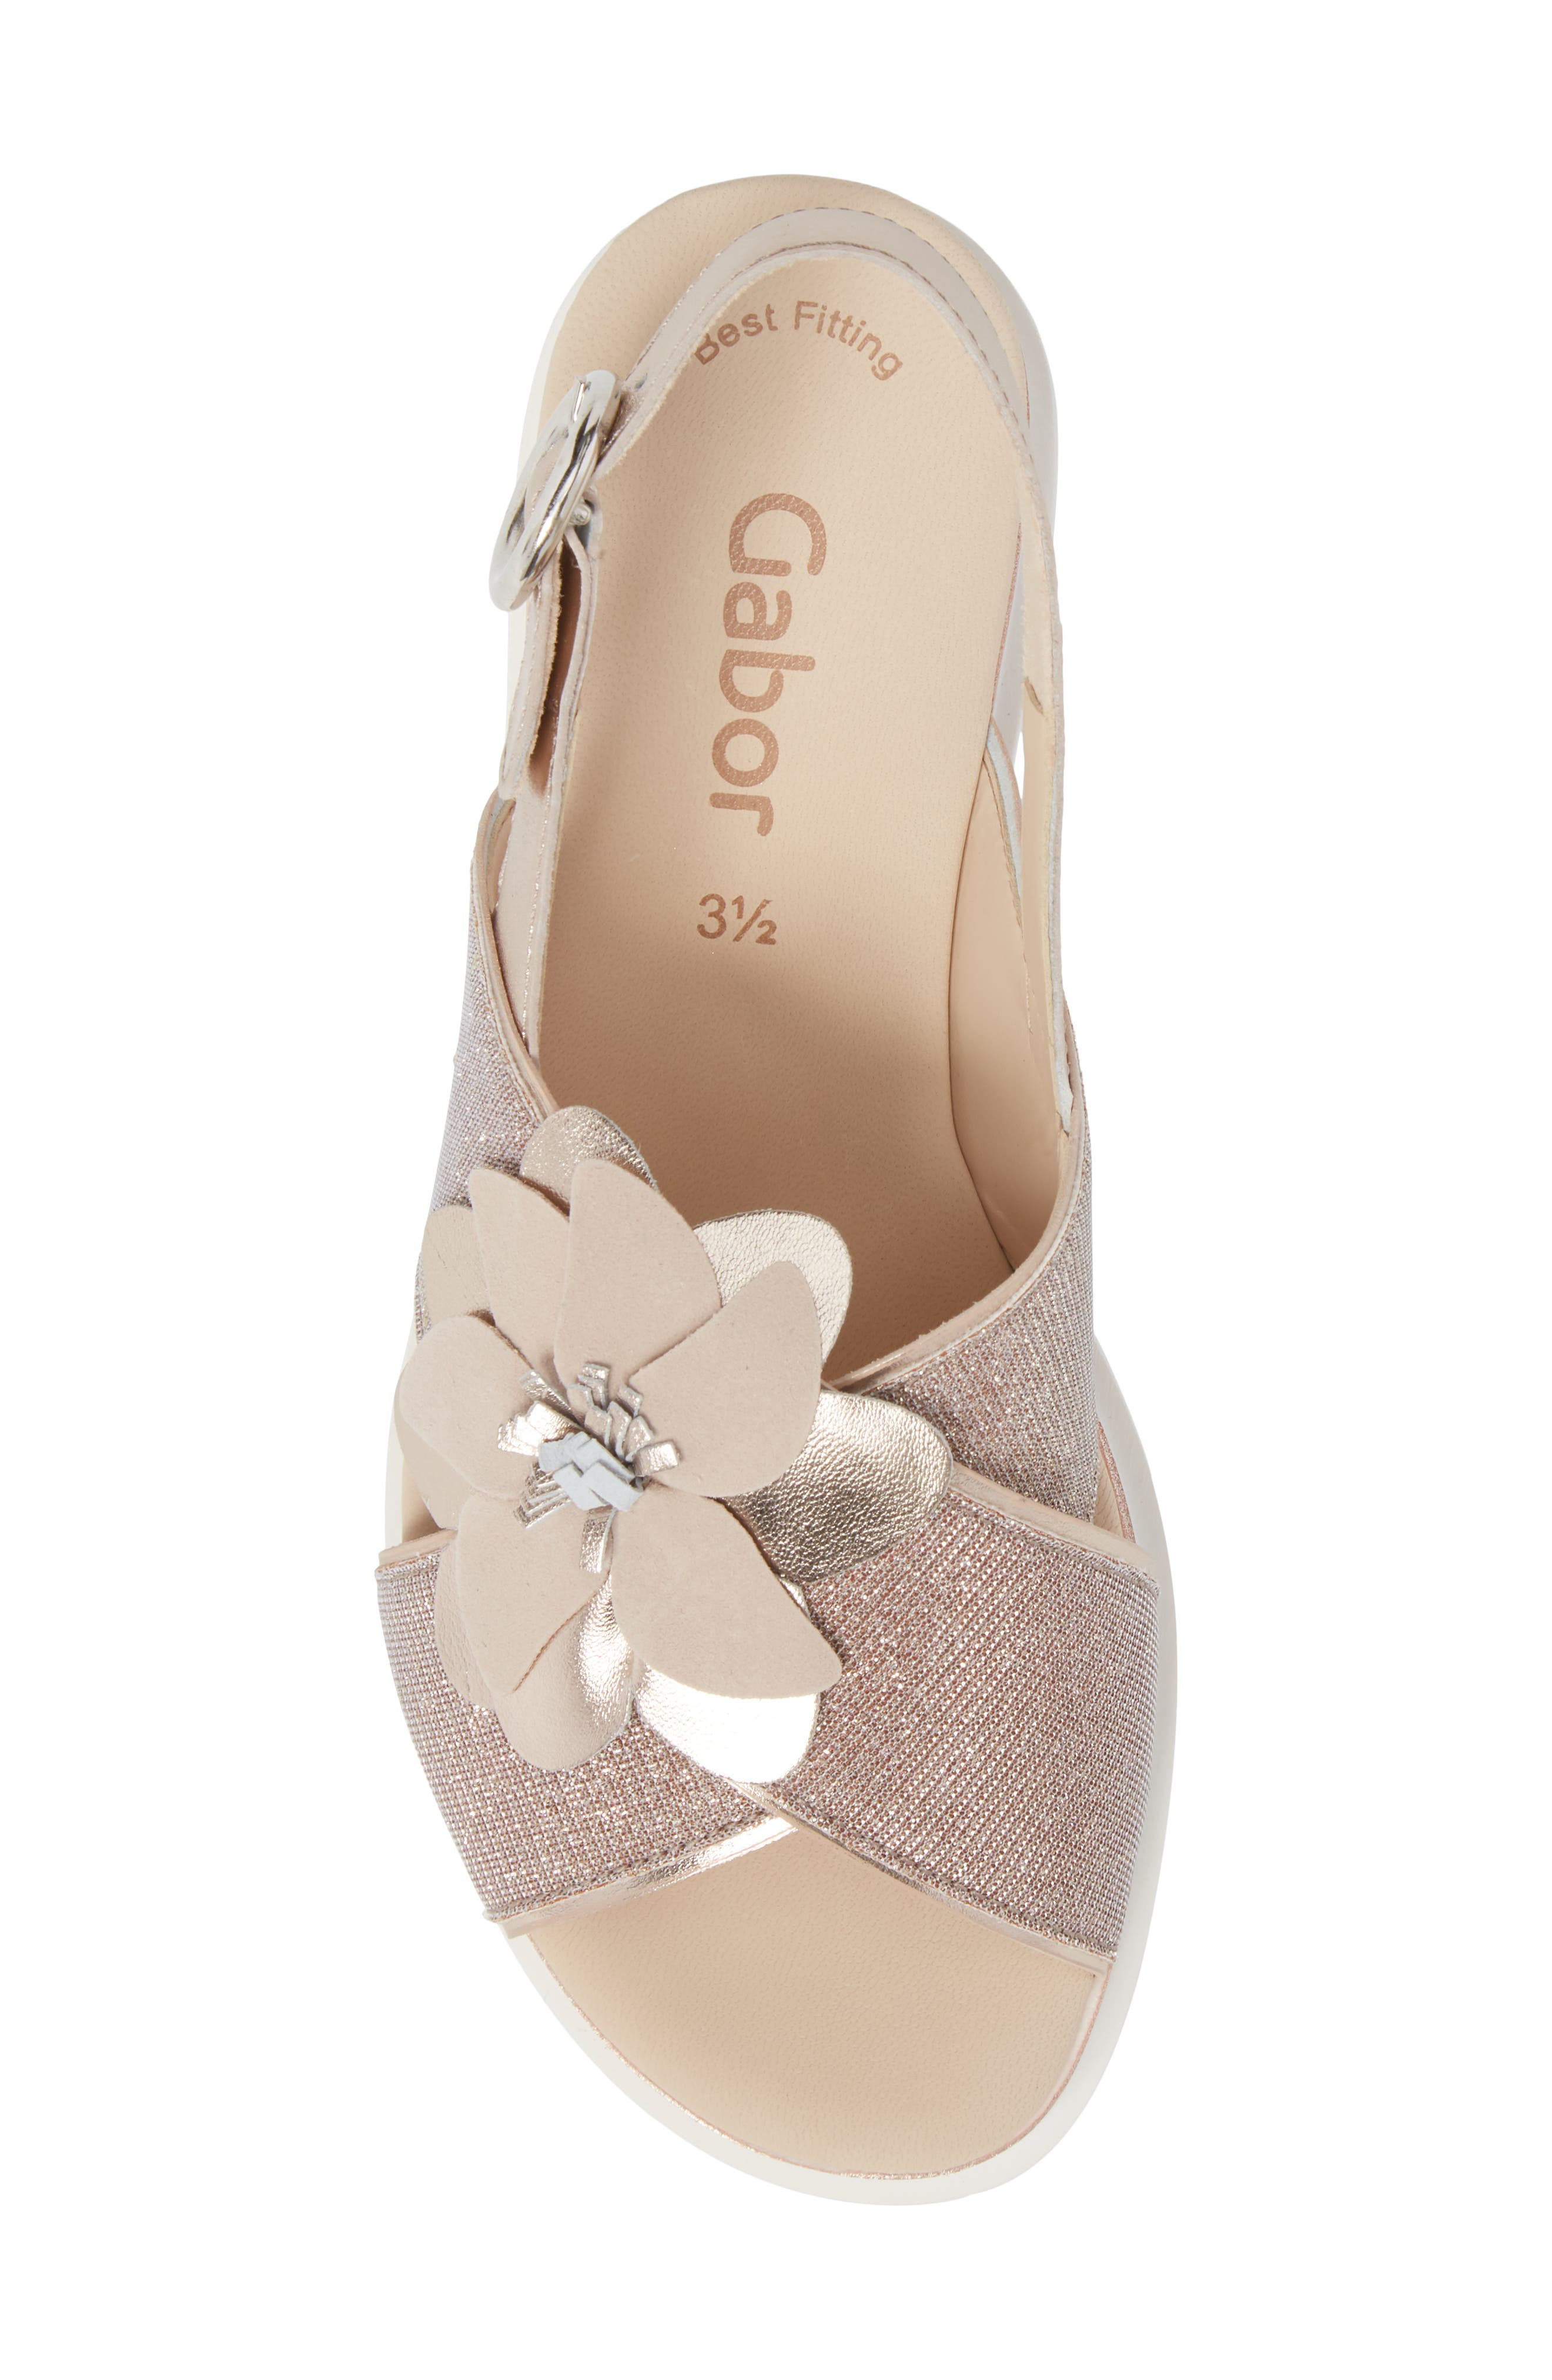 Flower Platform Sandal,                             Alternate thumbnail 5, color,                             710